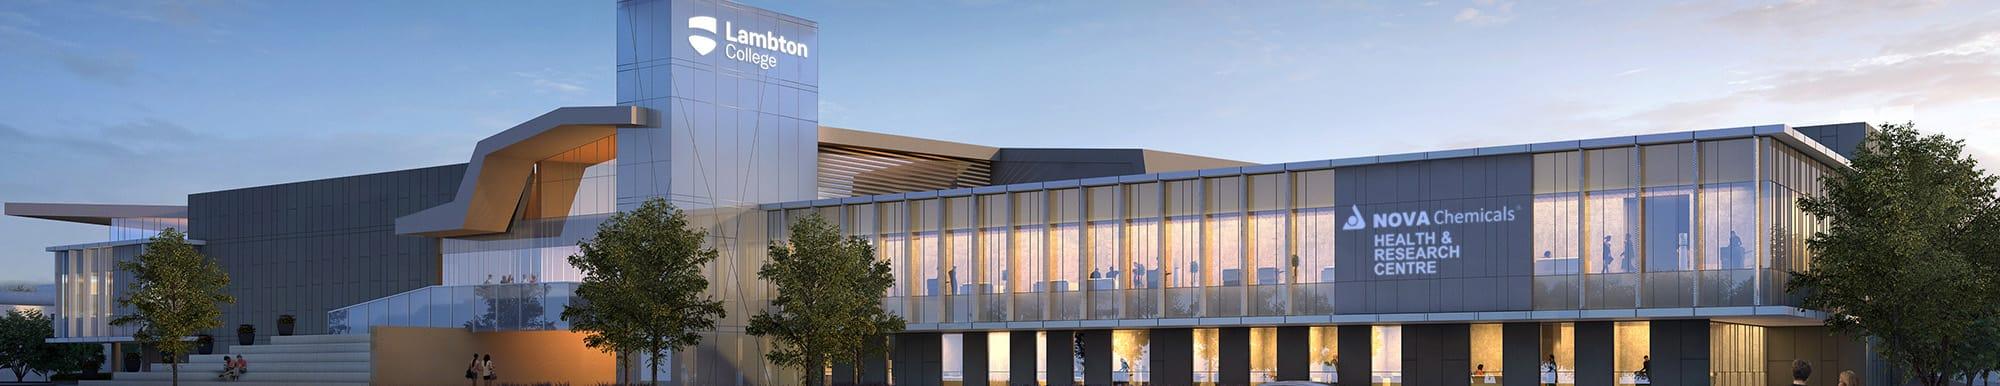 NOVA Chemicals Health & Research Centre